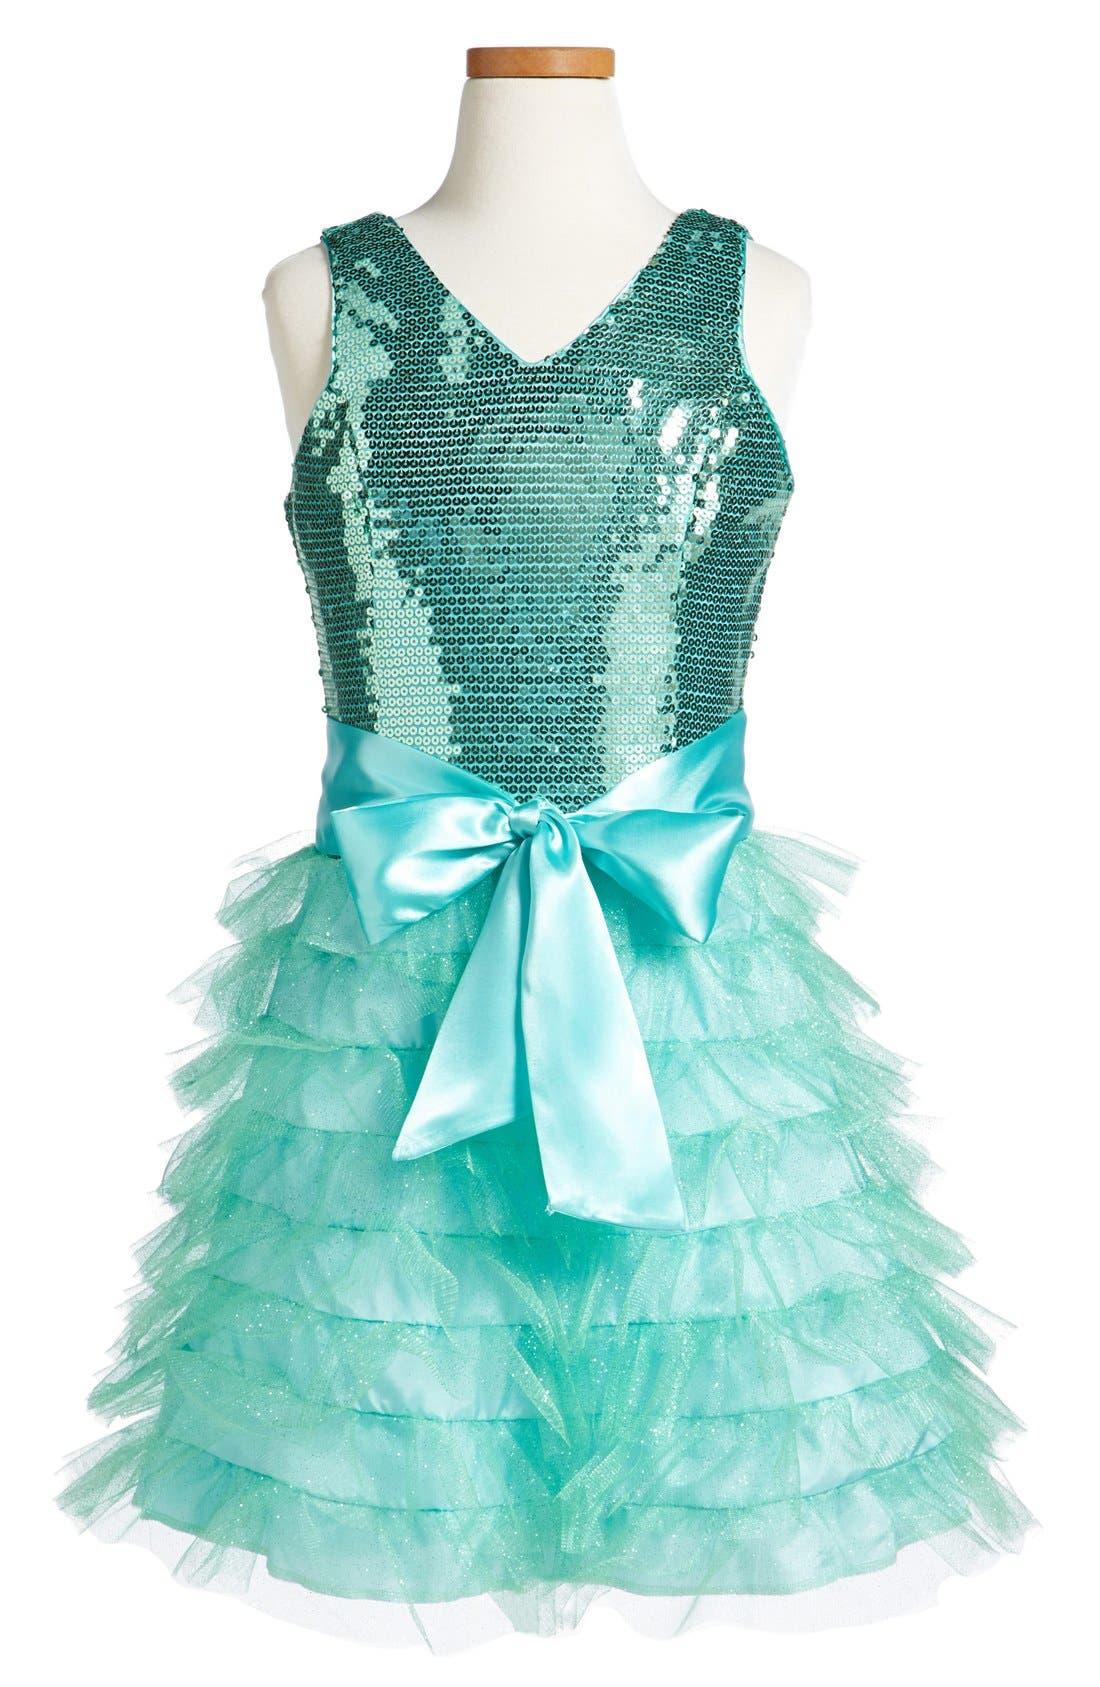 Alternate Image 1 Selected - Un Deux Trois Tiered Ruffle Dress (Big Girls)